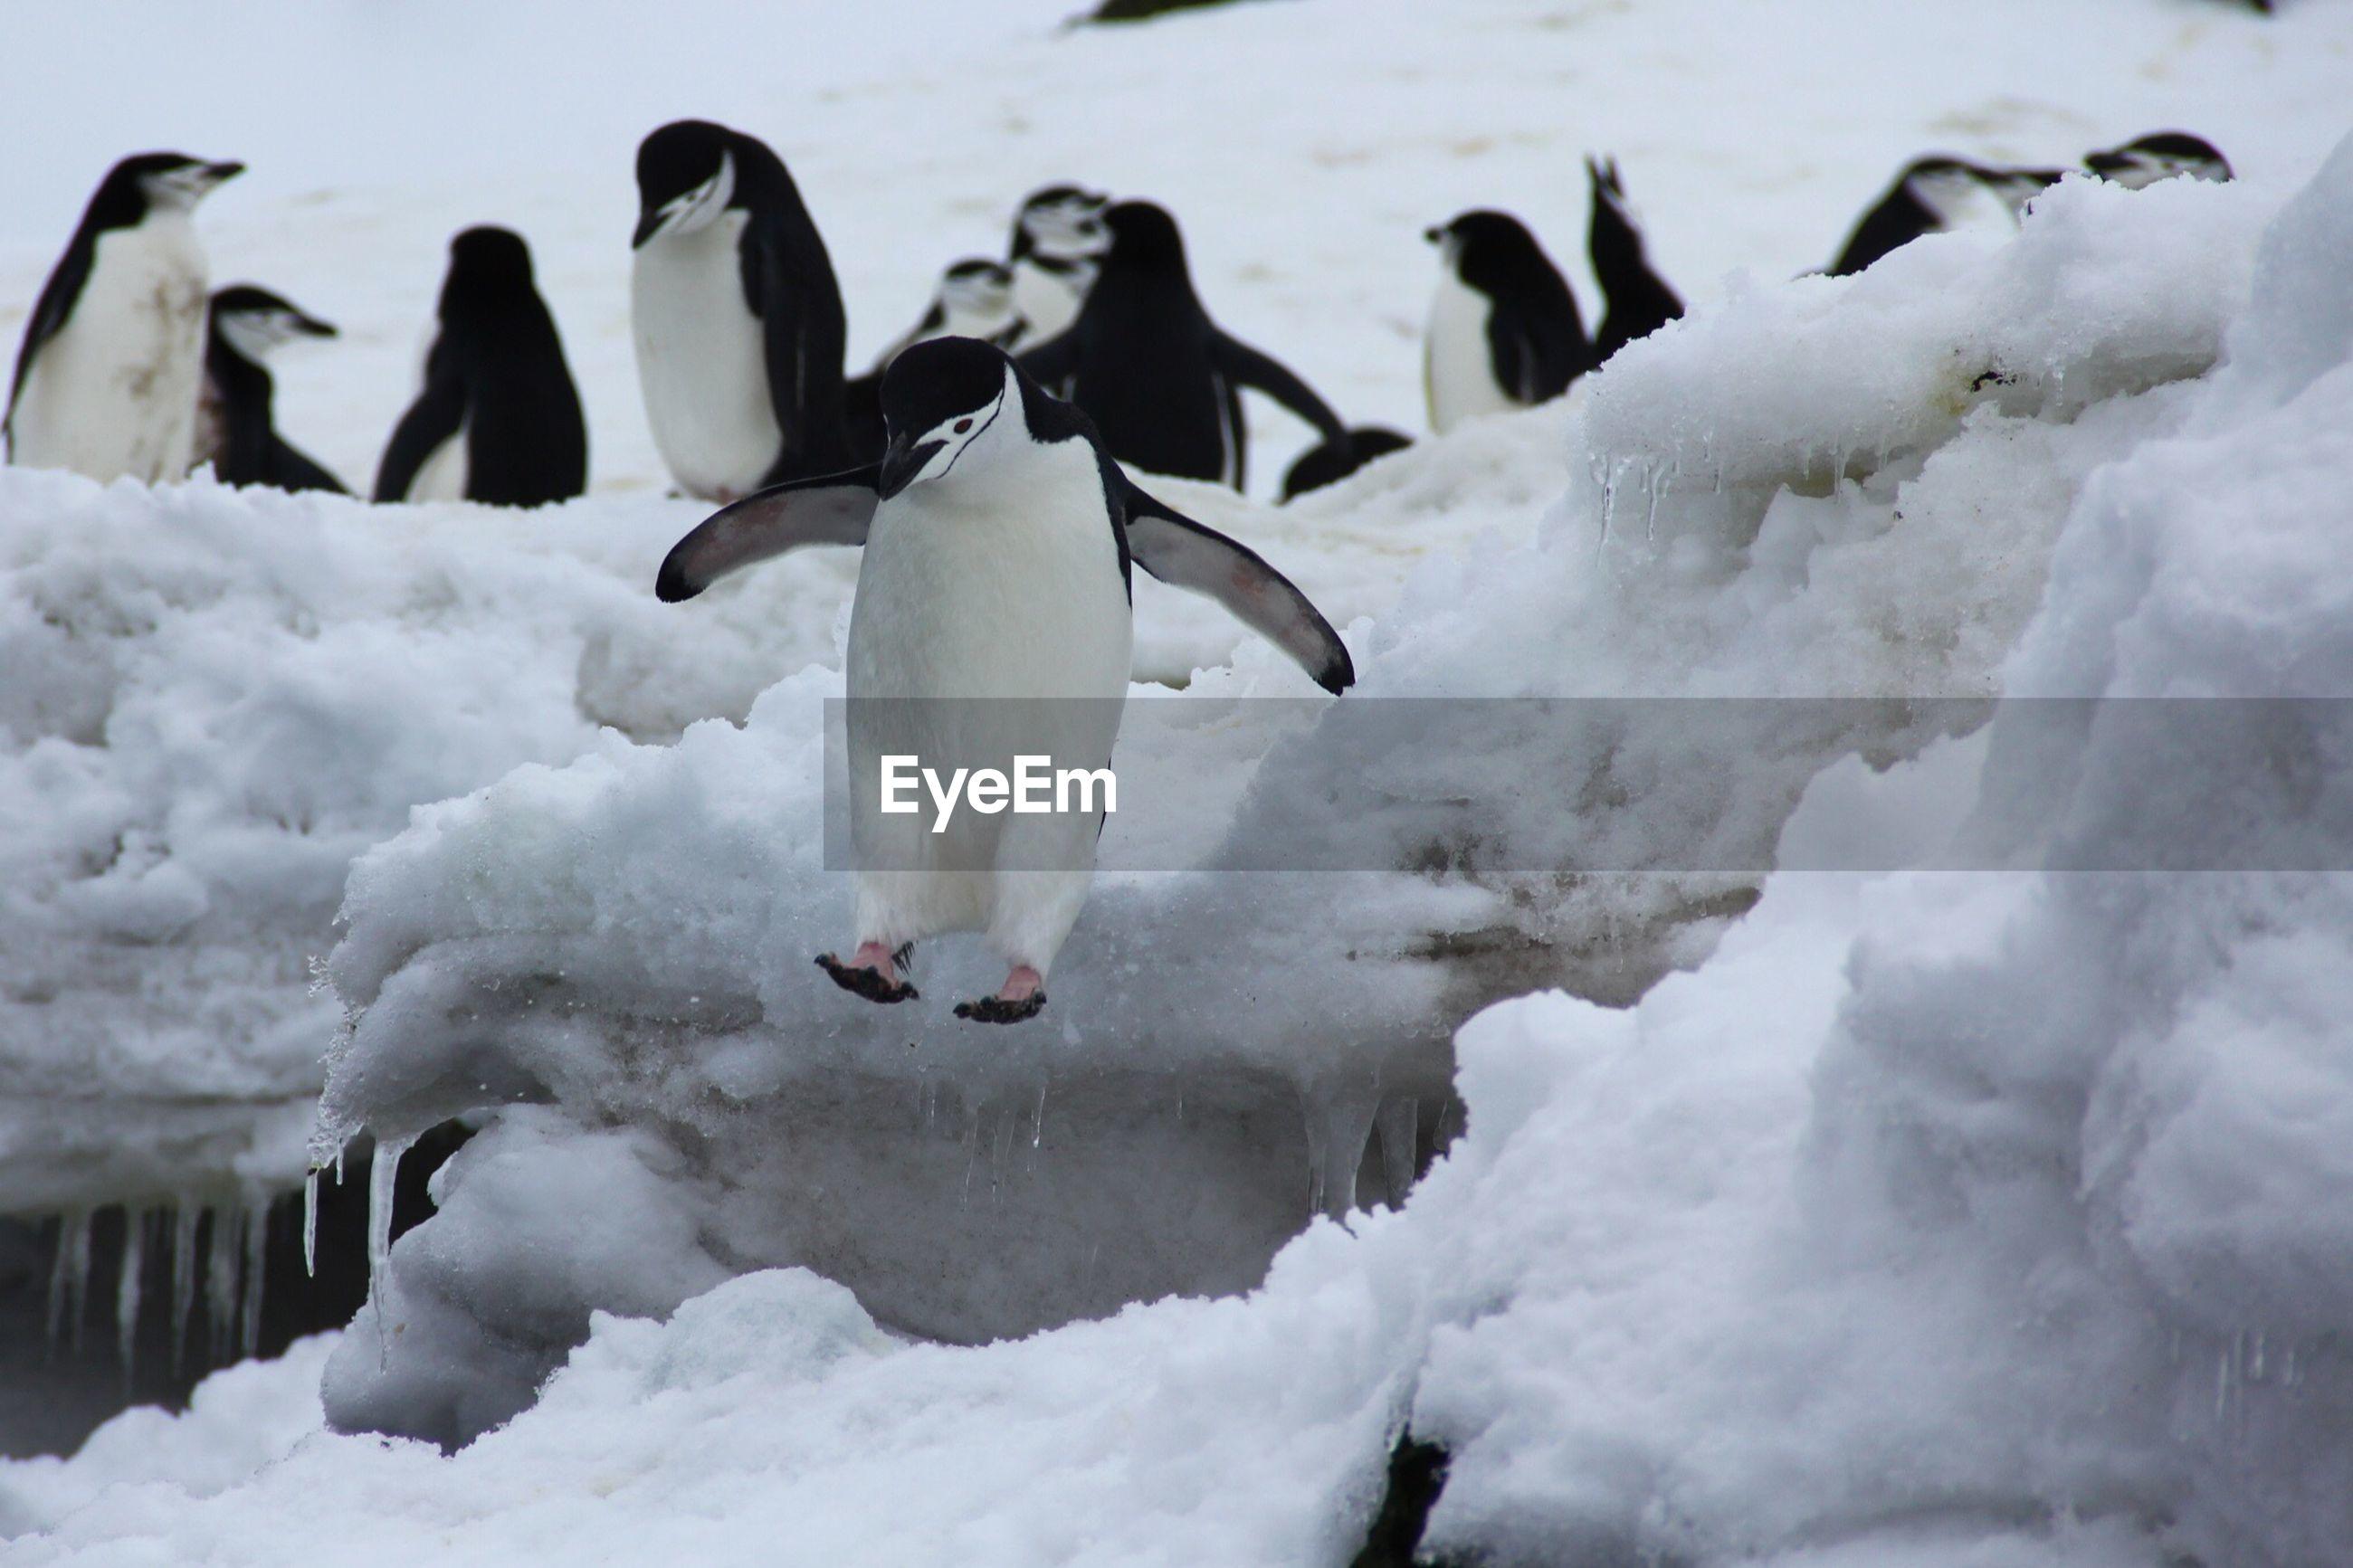 Penguins walking in snow covered landscape